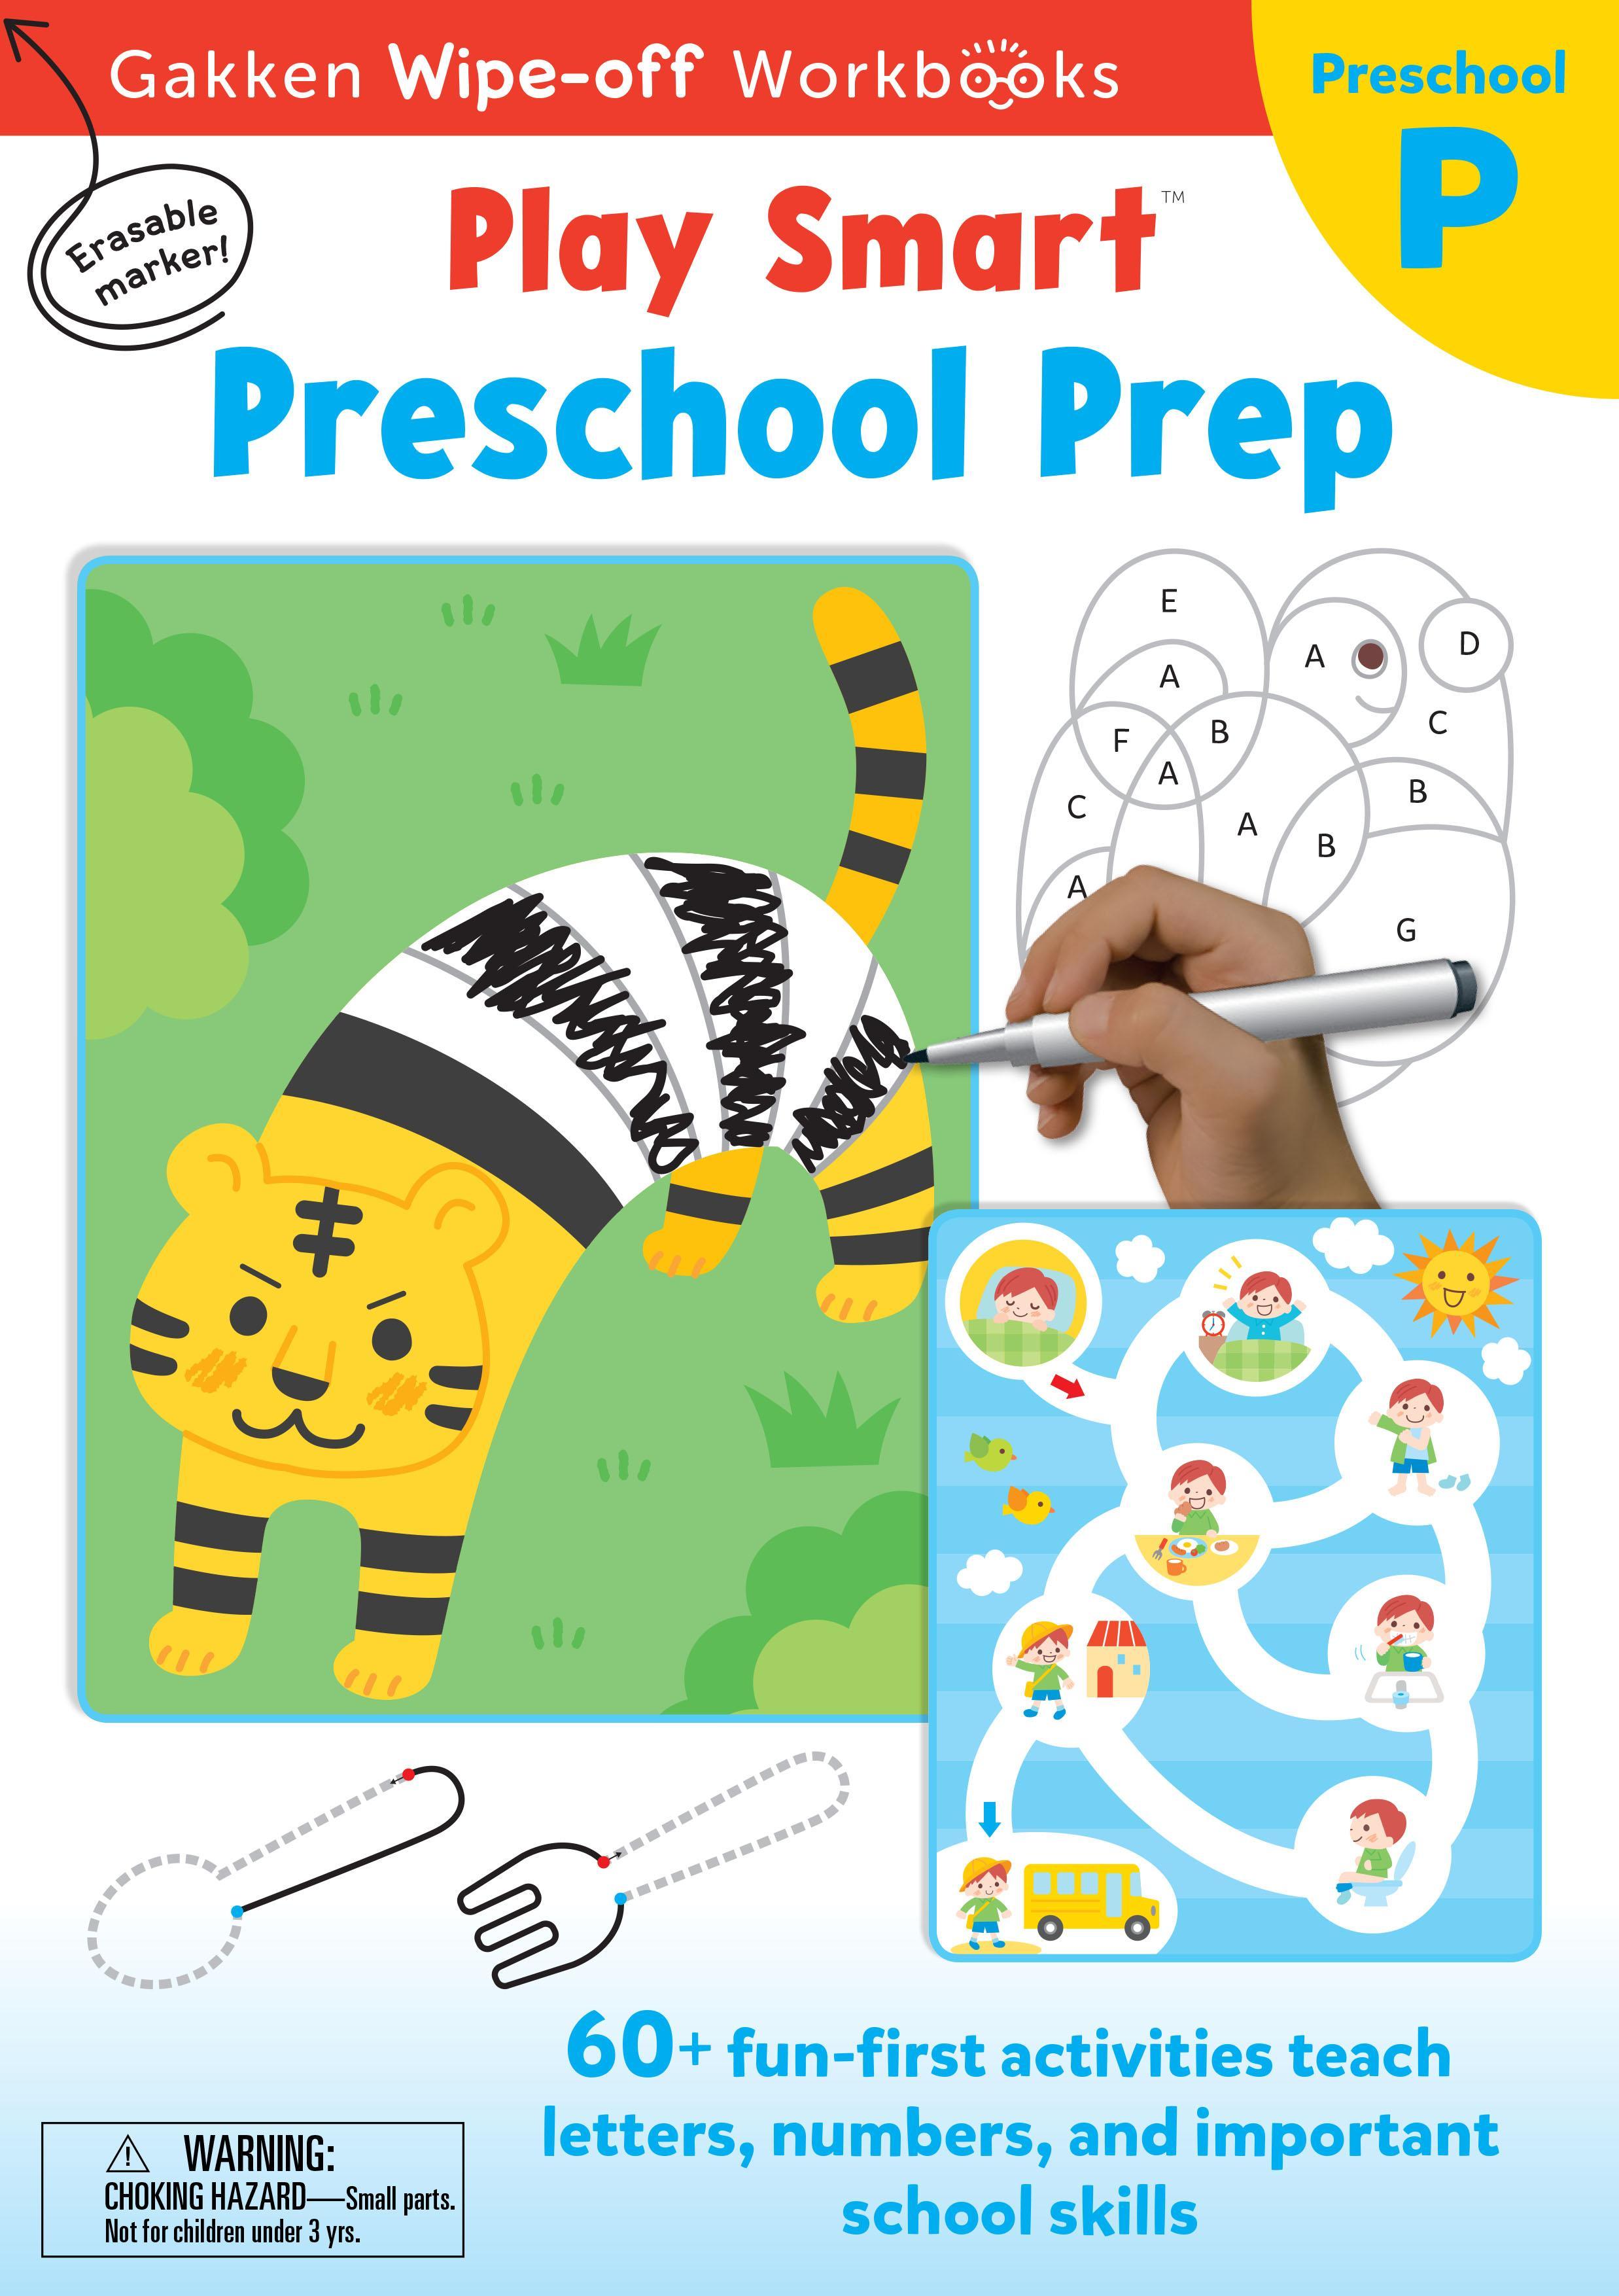 PlaySmart :  Wipe&Off Preschool Prep